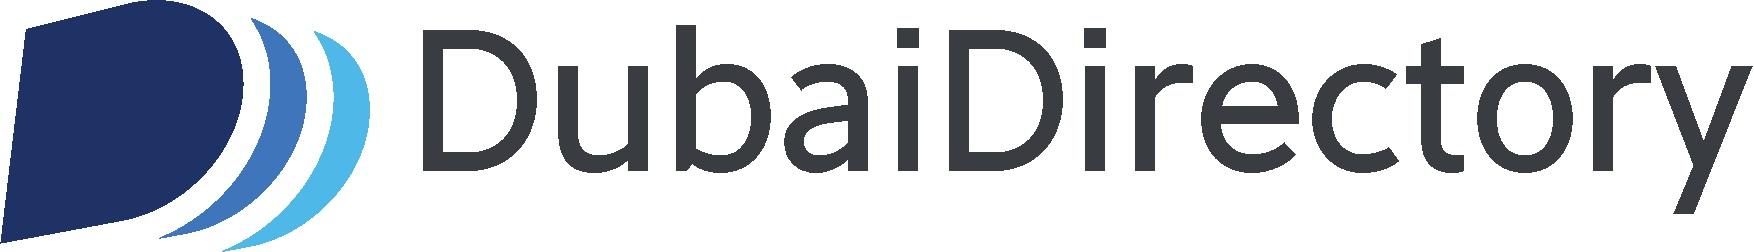 DubaiDirectory.com